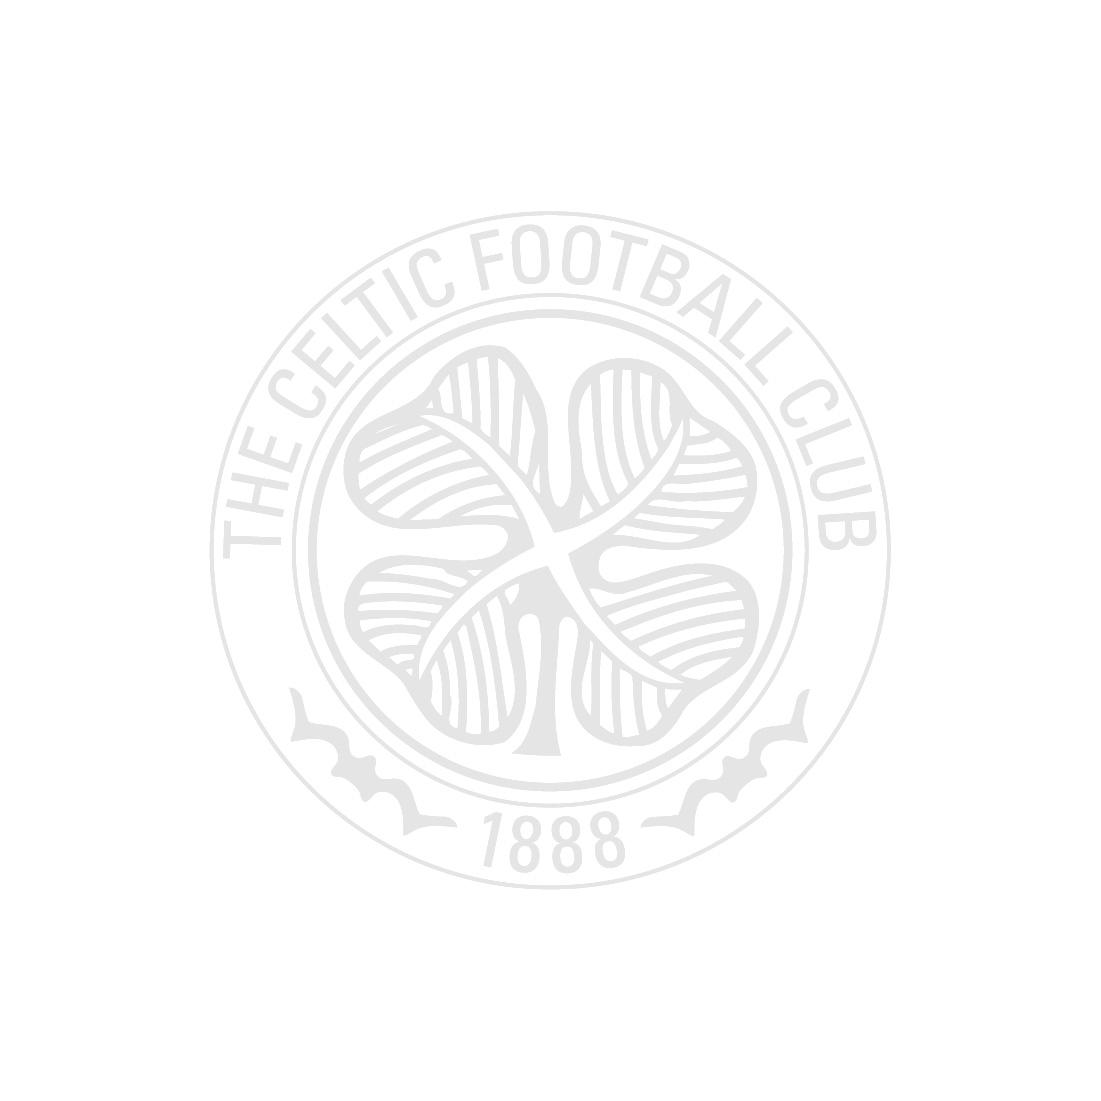 Celtic Mens Away Shirt 19/20 with Sponsor Back